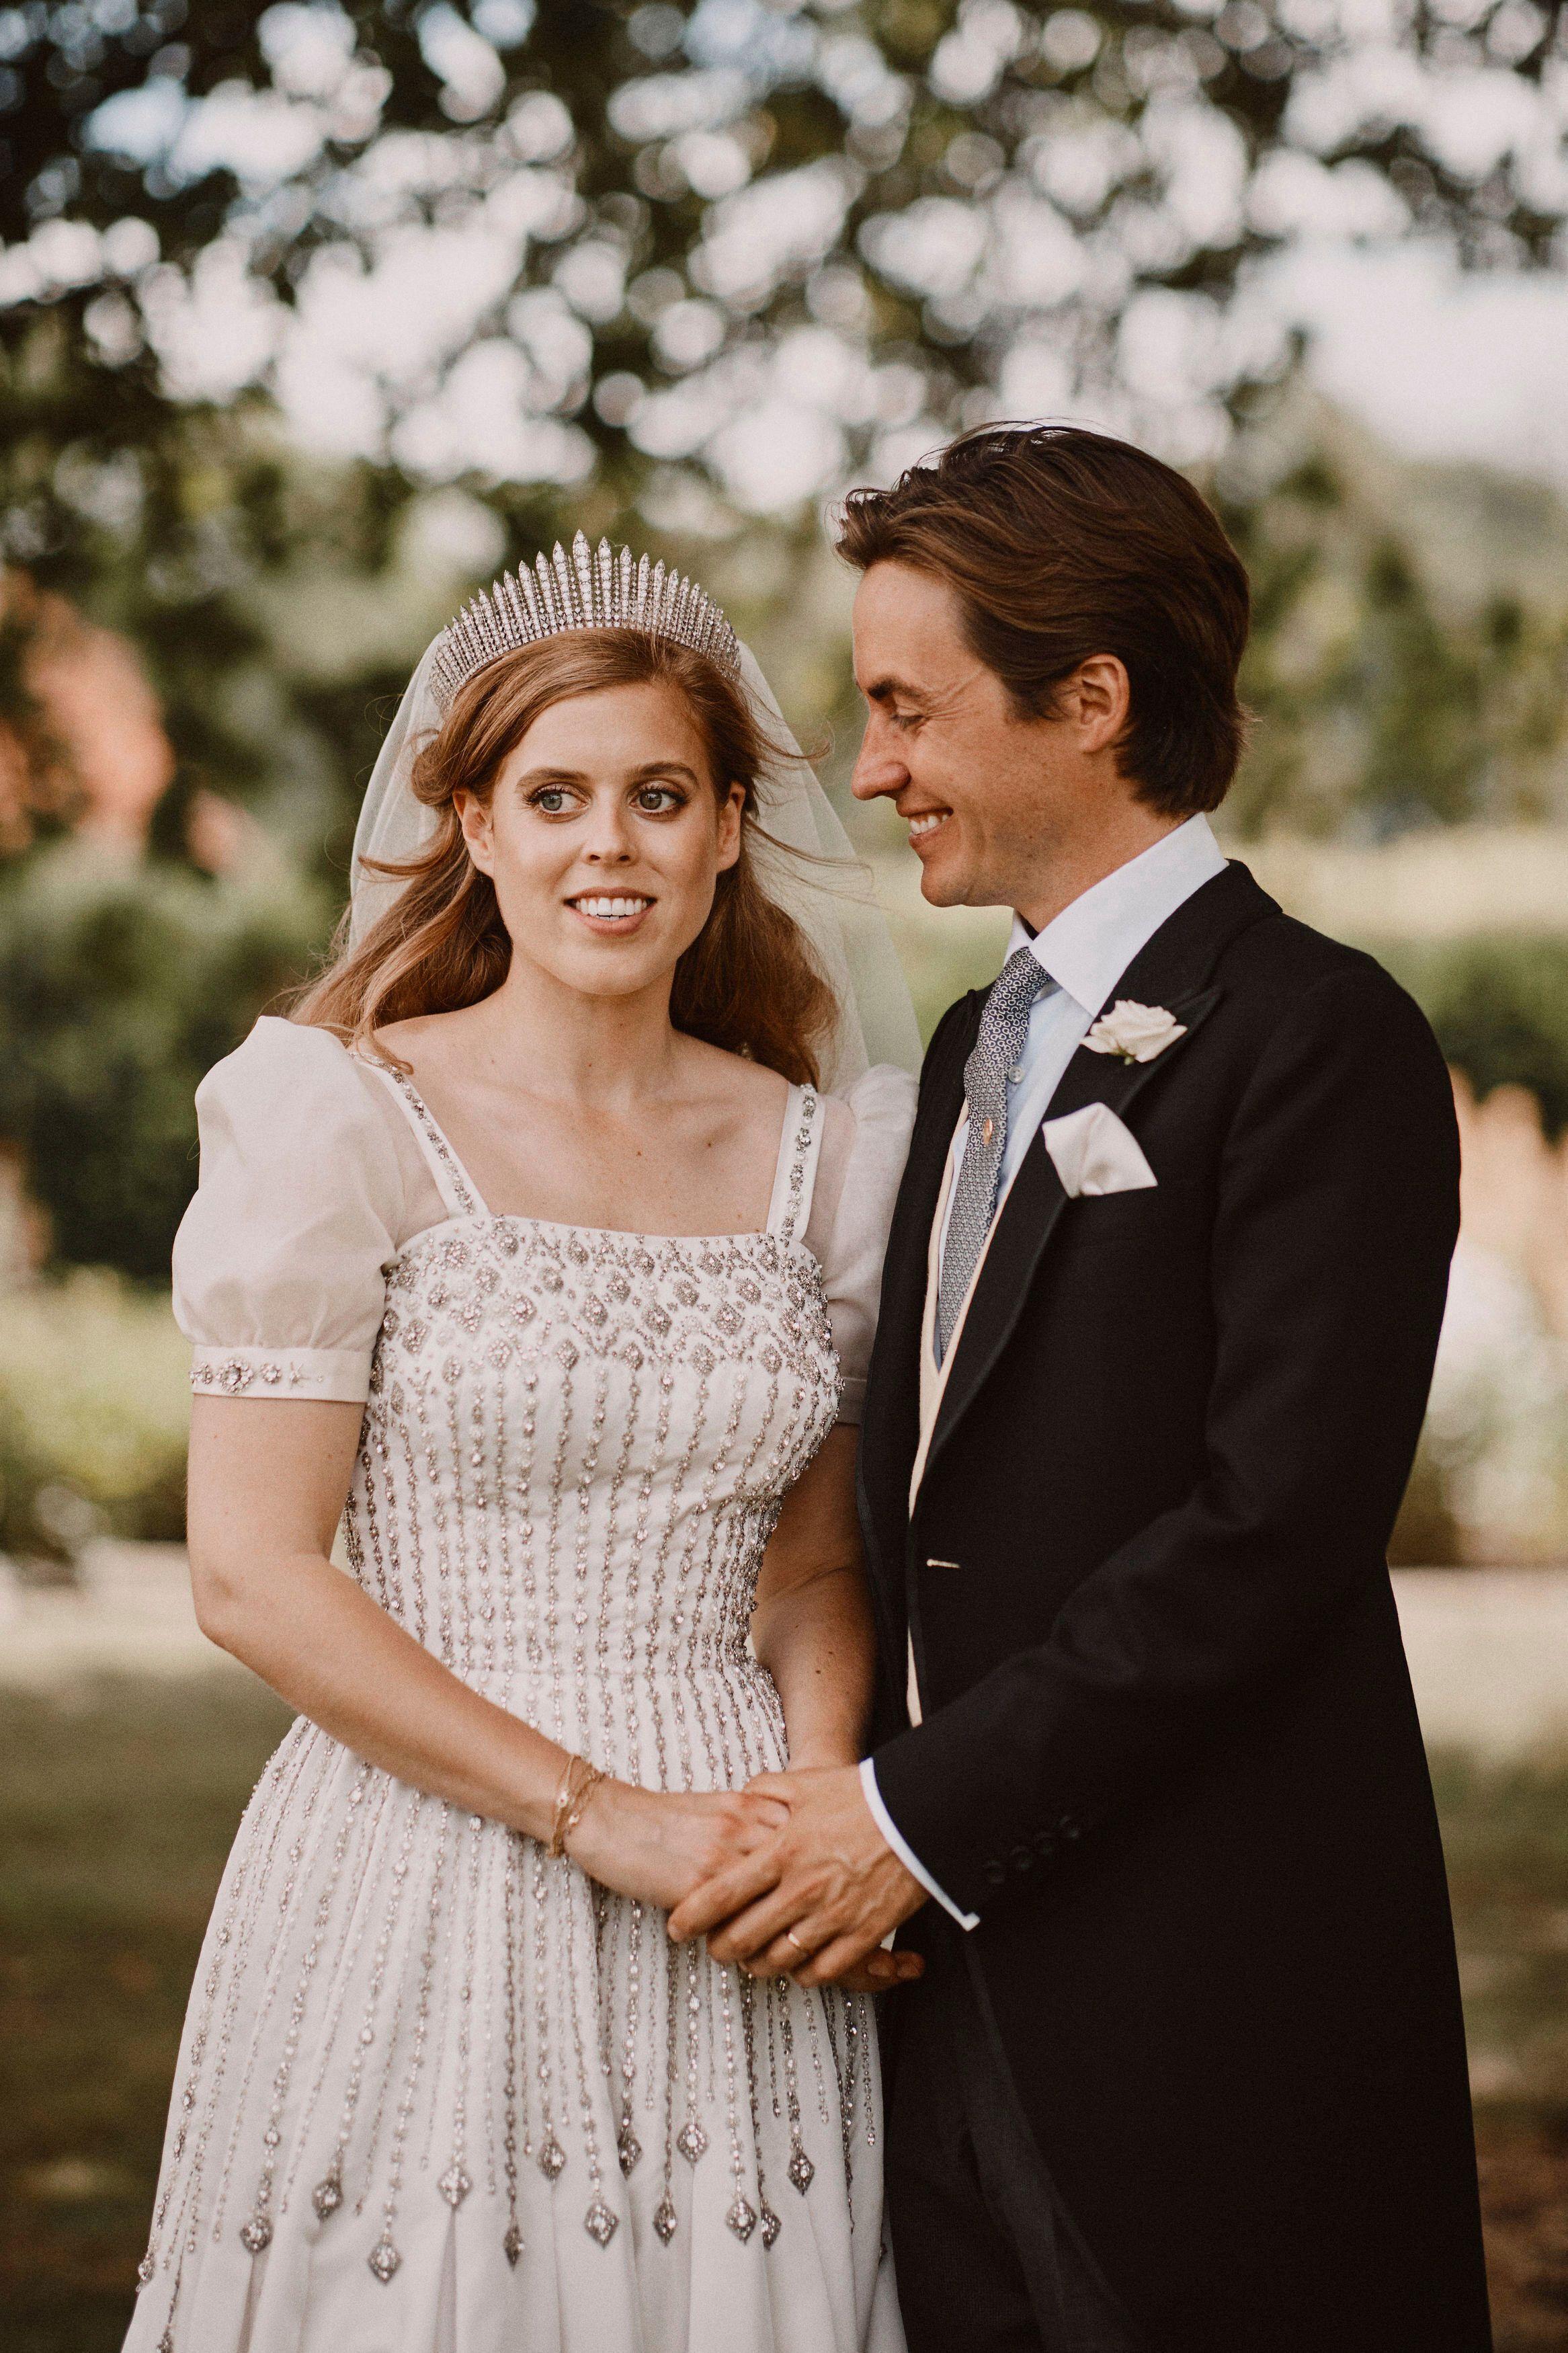 Princess Beatrice Wore Queen Elizabeth's Dress And Tiara For Her Wedding